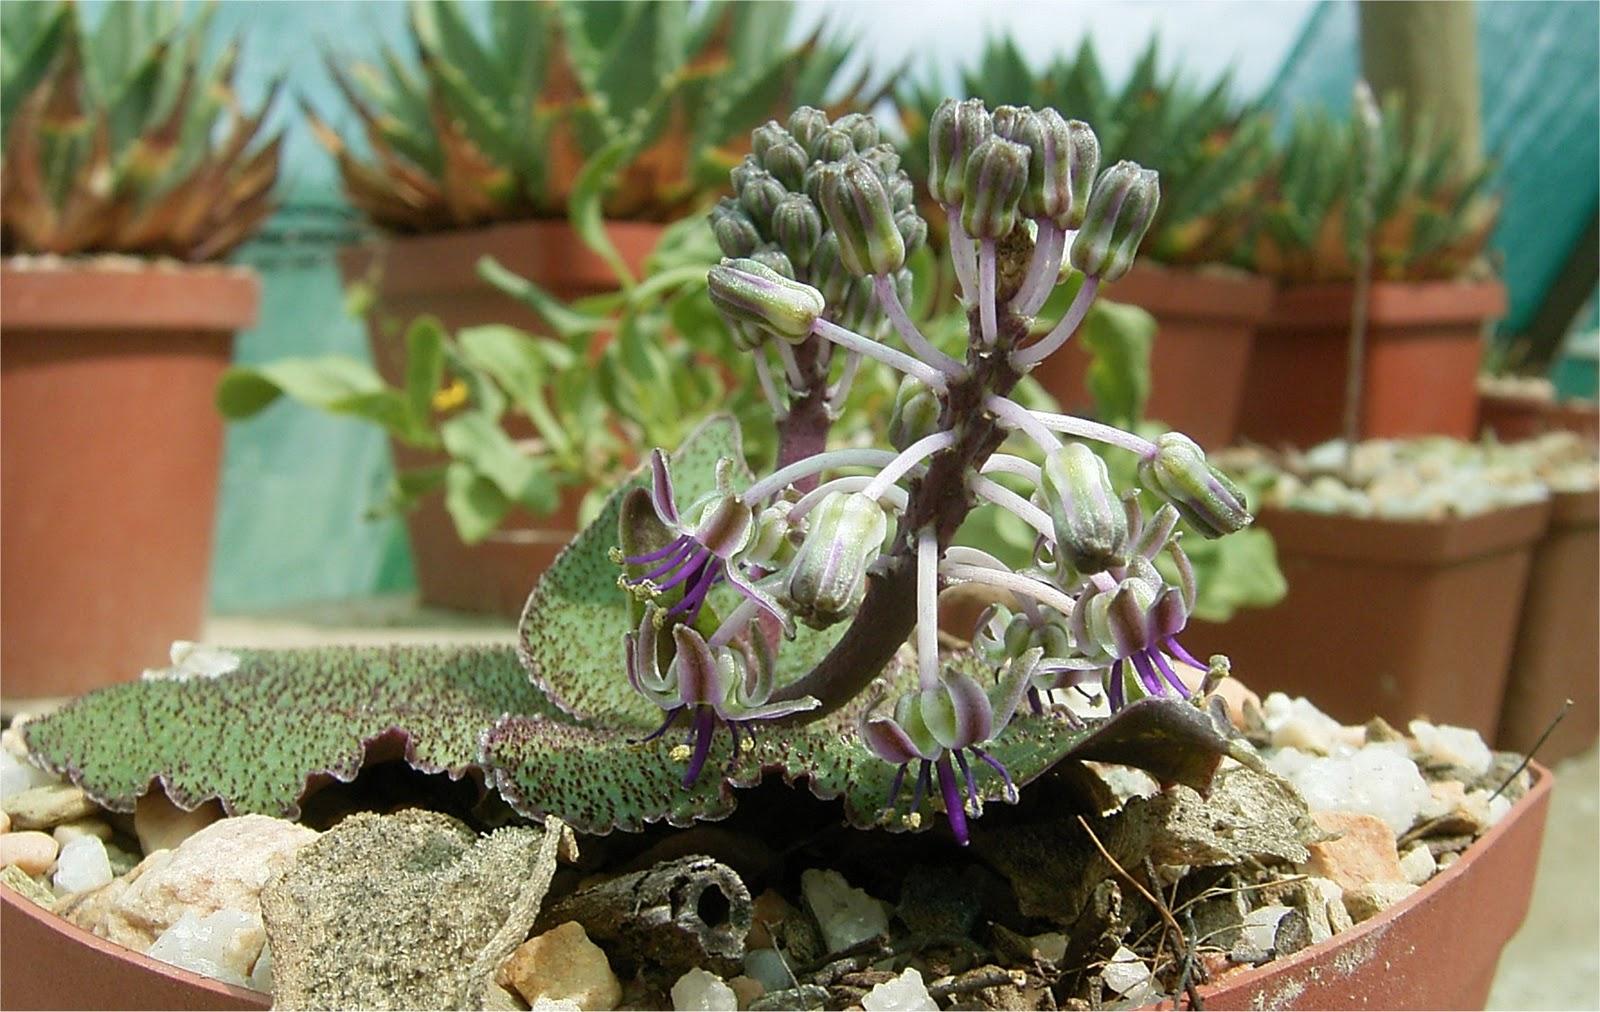 Ledebouria ovatifolia ssp. scabrida  flowers